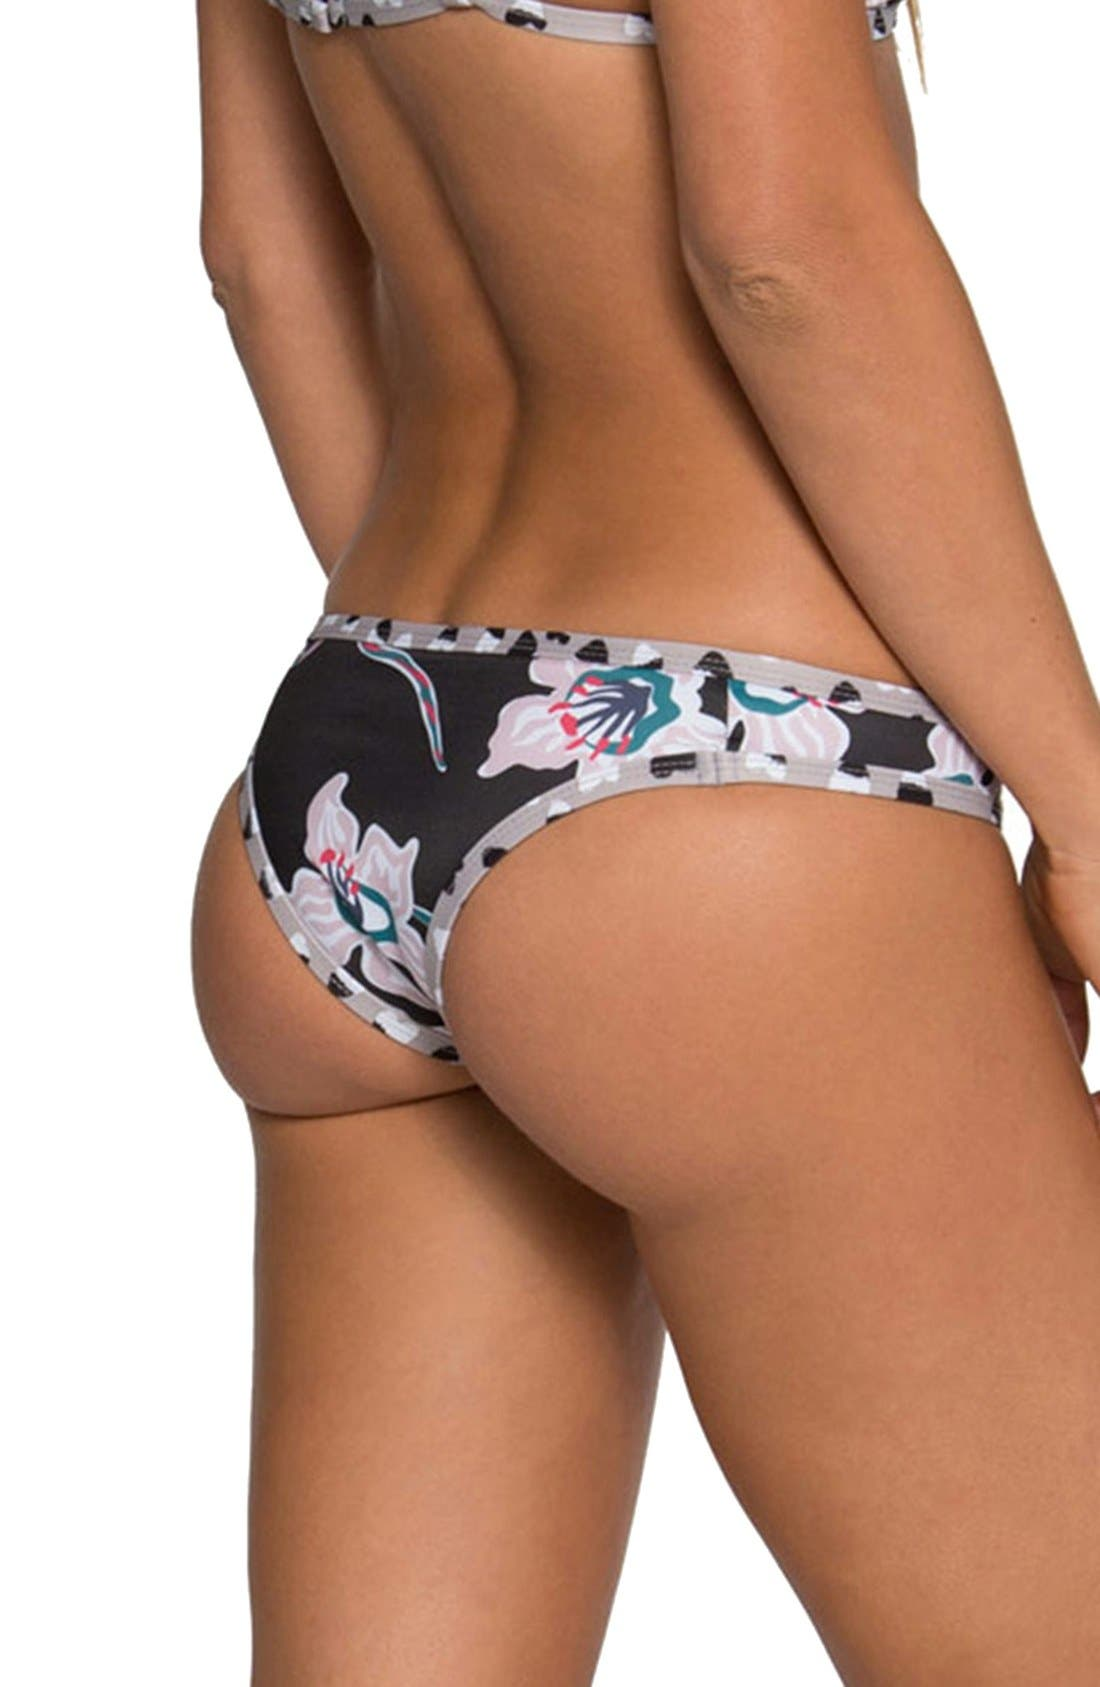 'Jayden' Minimal Coverage Bikini Bottoms,                             Alternate thumbnail 3, color,                             005